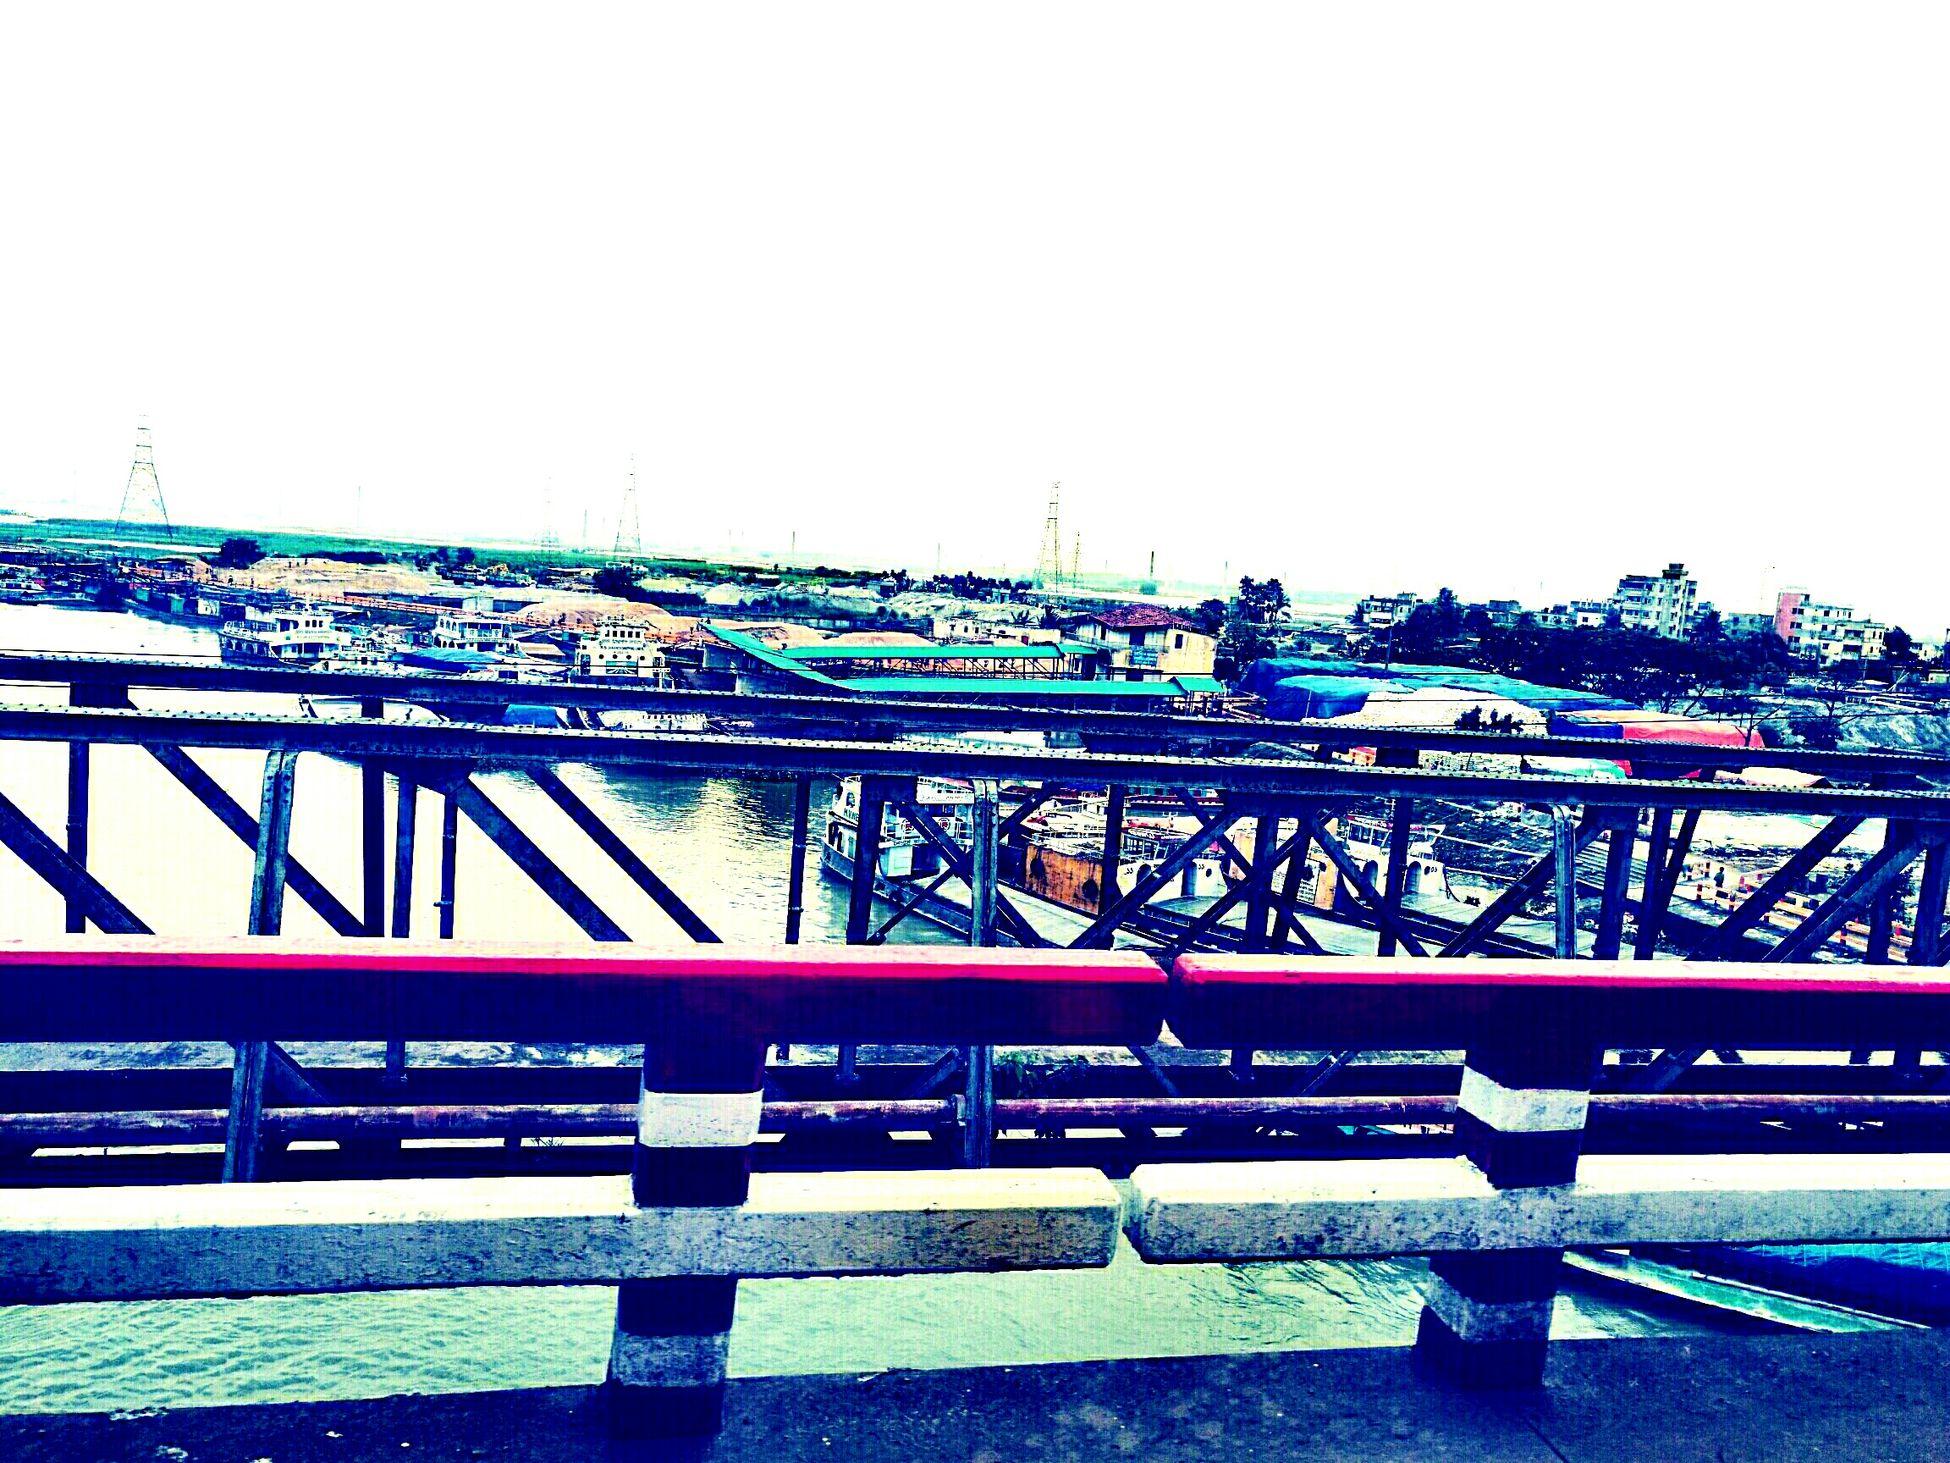 43 Golden Moments the old school Street Cellphone Photography Memories No DSLR Man Streetphotography Riverside River Riverwalk Huawei Mate 8